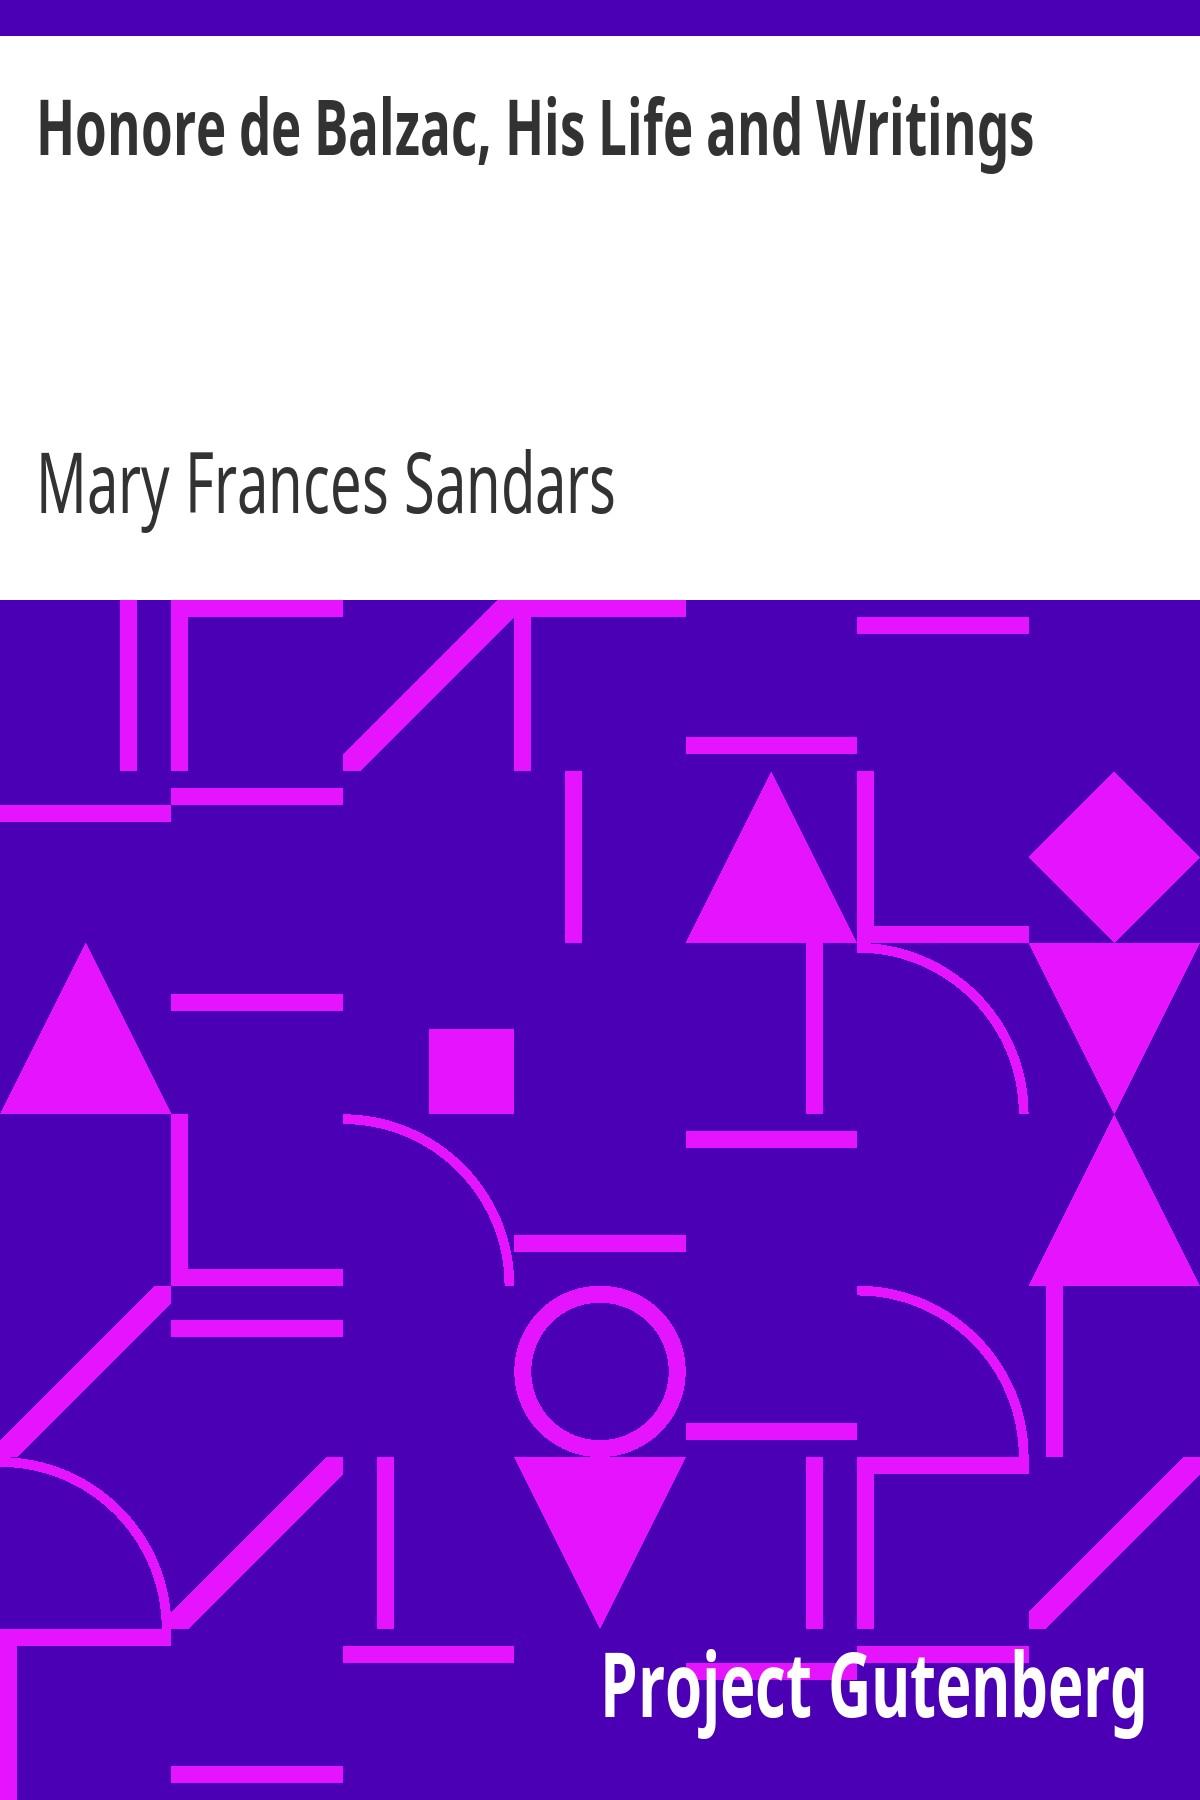 Mary Frances Sandars Honore de Balzac, His Life and Writings